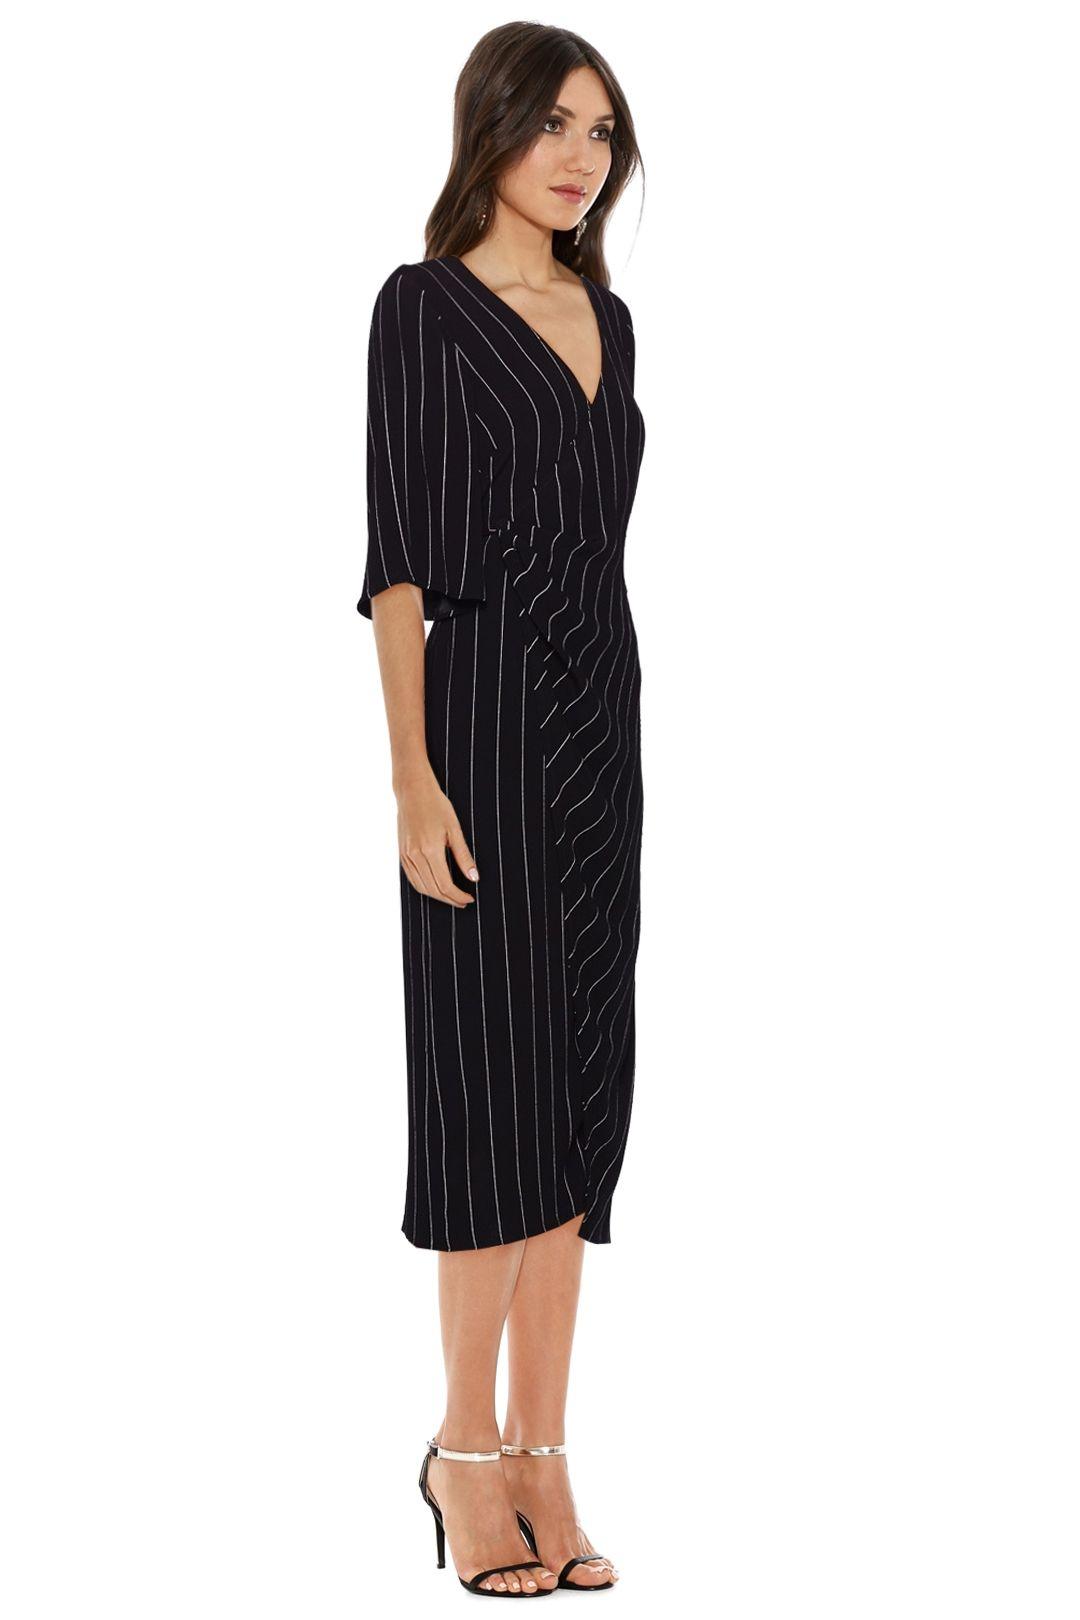 Bastille Dress | Dresses, Fashion, Model  |Bastille Dress